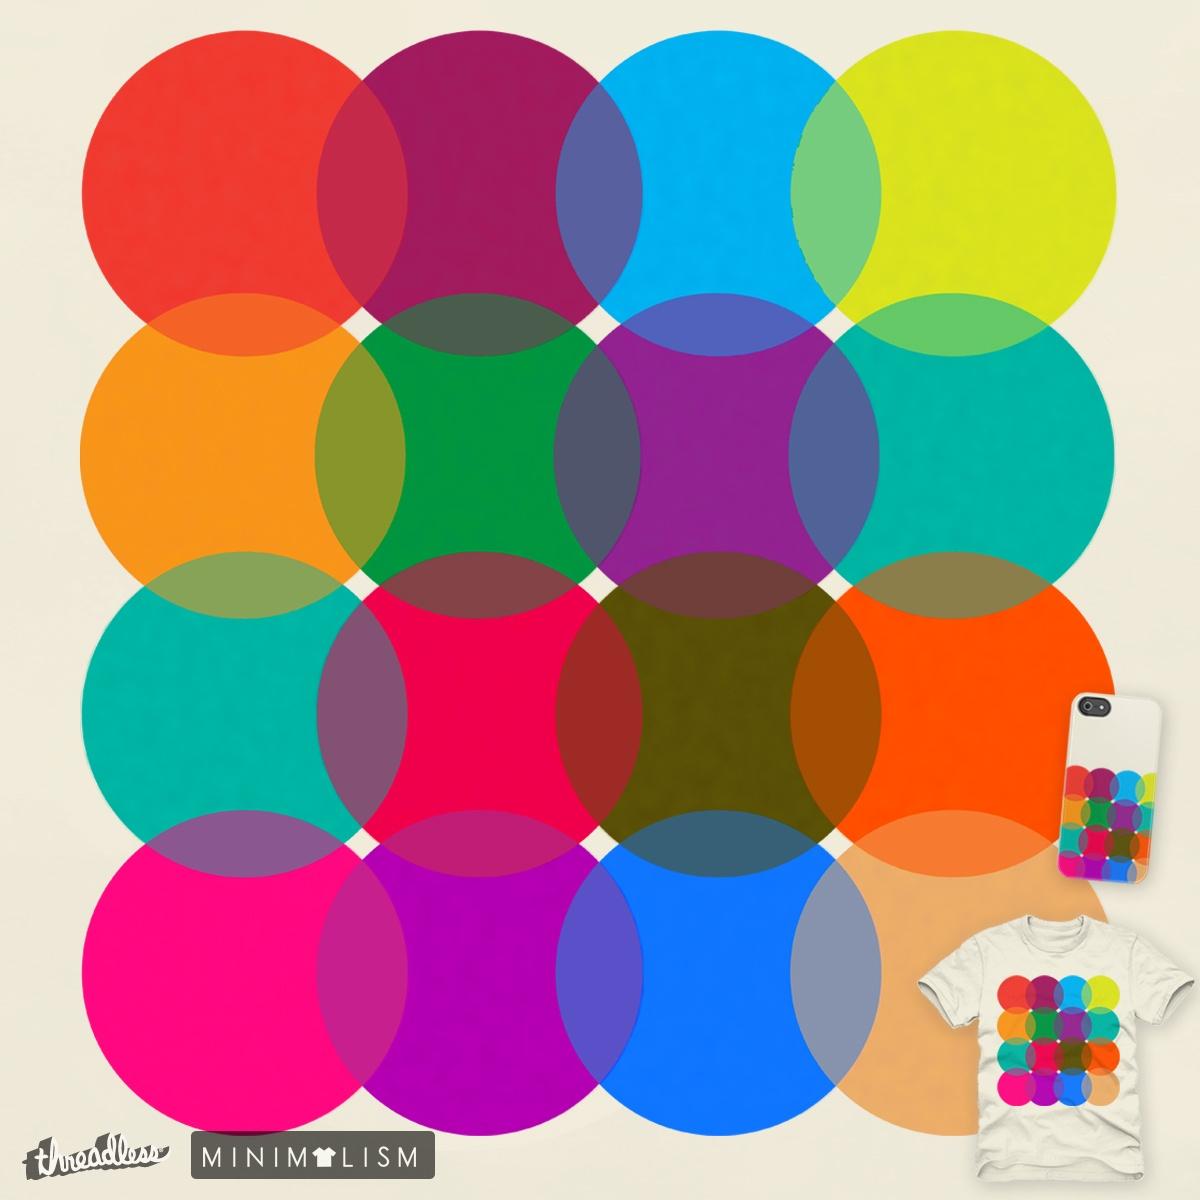 Score venn diagram of color by jackiefarkas on threadless venn diagram of color by jackiefarkas on threadless pooptronica Choice Image